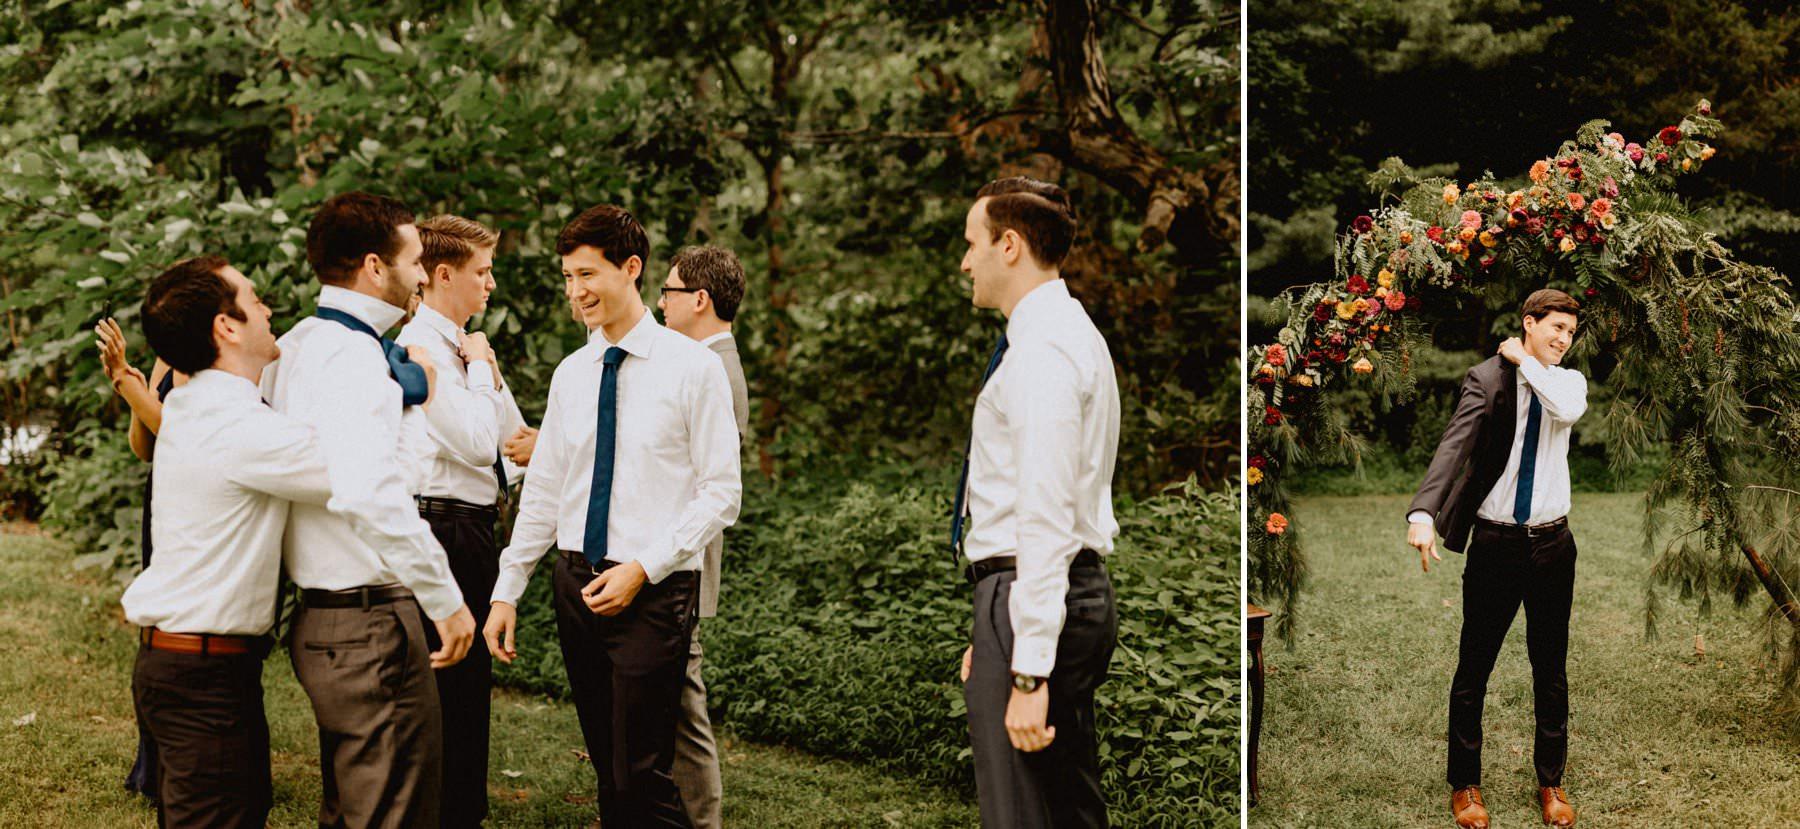 pennsylvania-private-estate-wedding-23.jpg